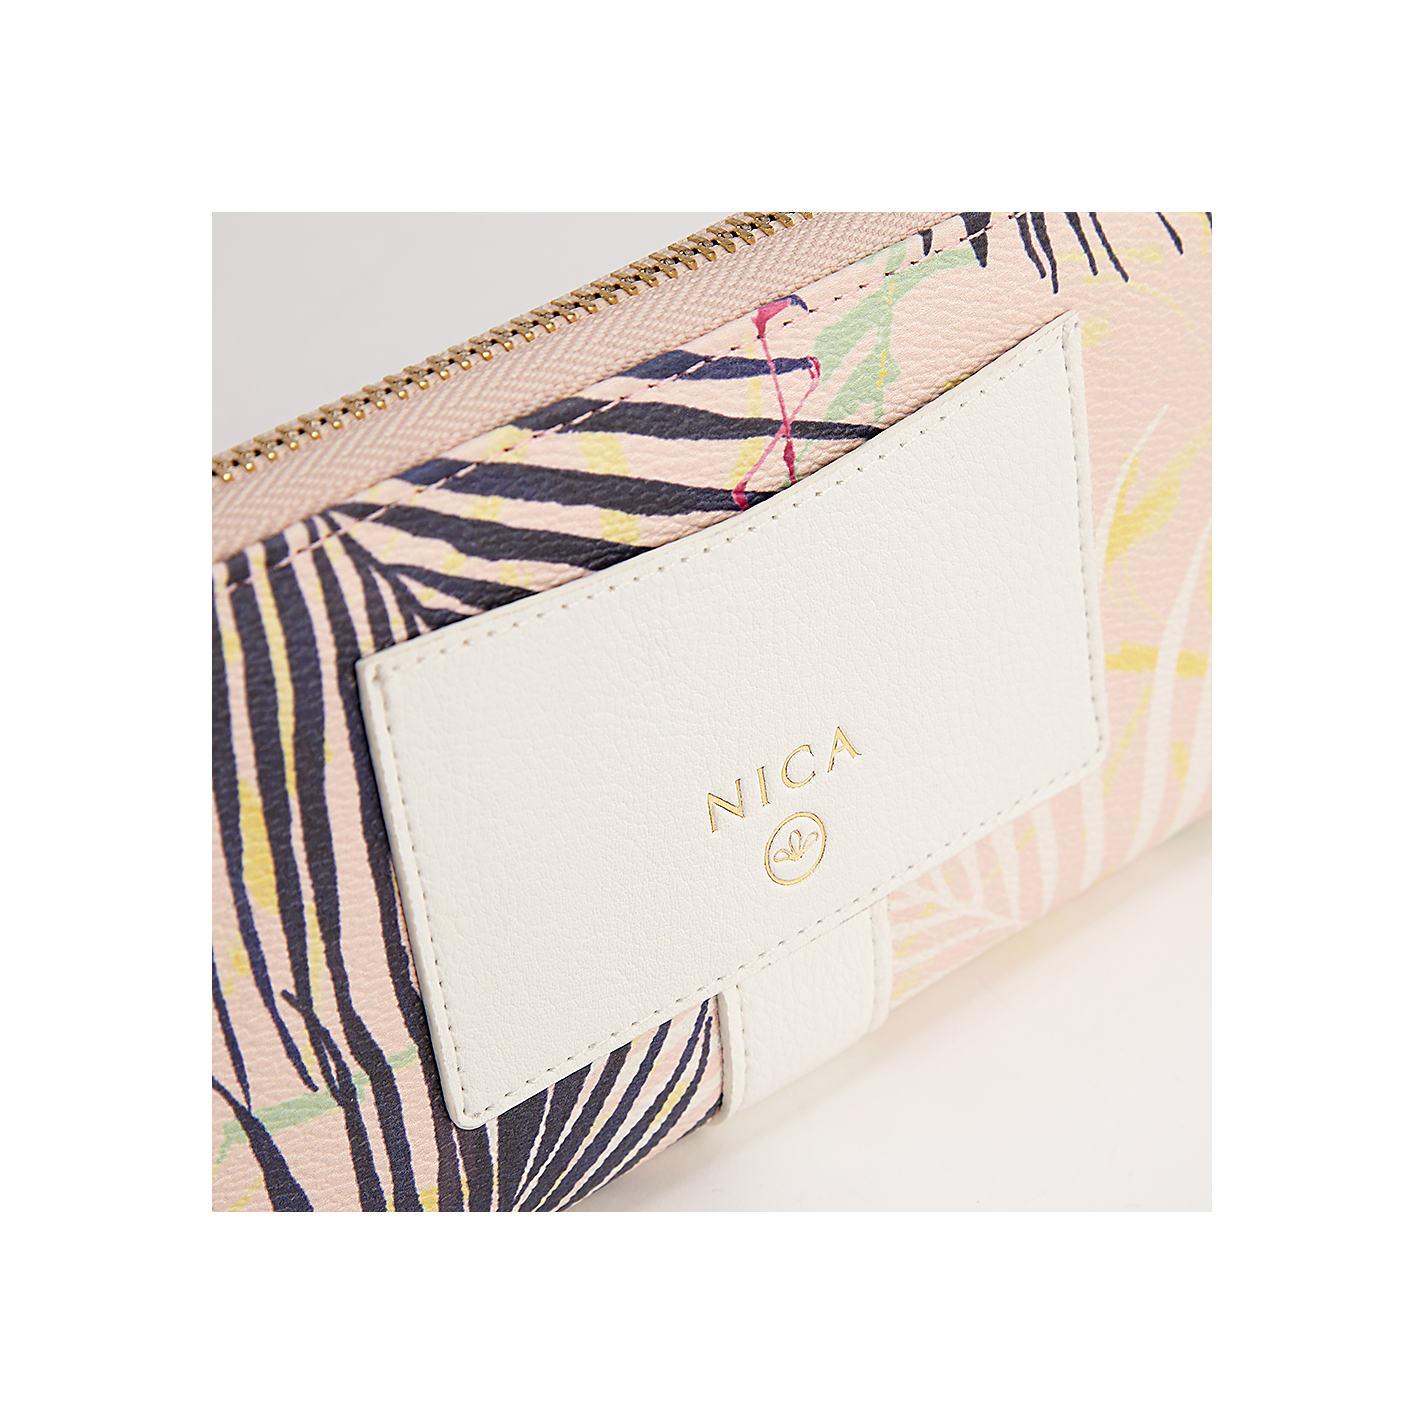 designer handbags chloe - Buy Nica Chloe Palm Print Large Zip Around Purse, Multi | John Lewis